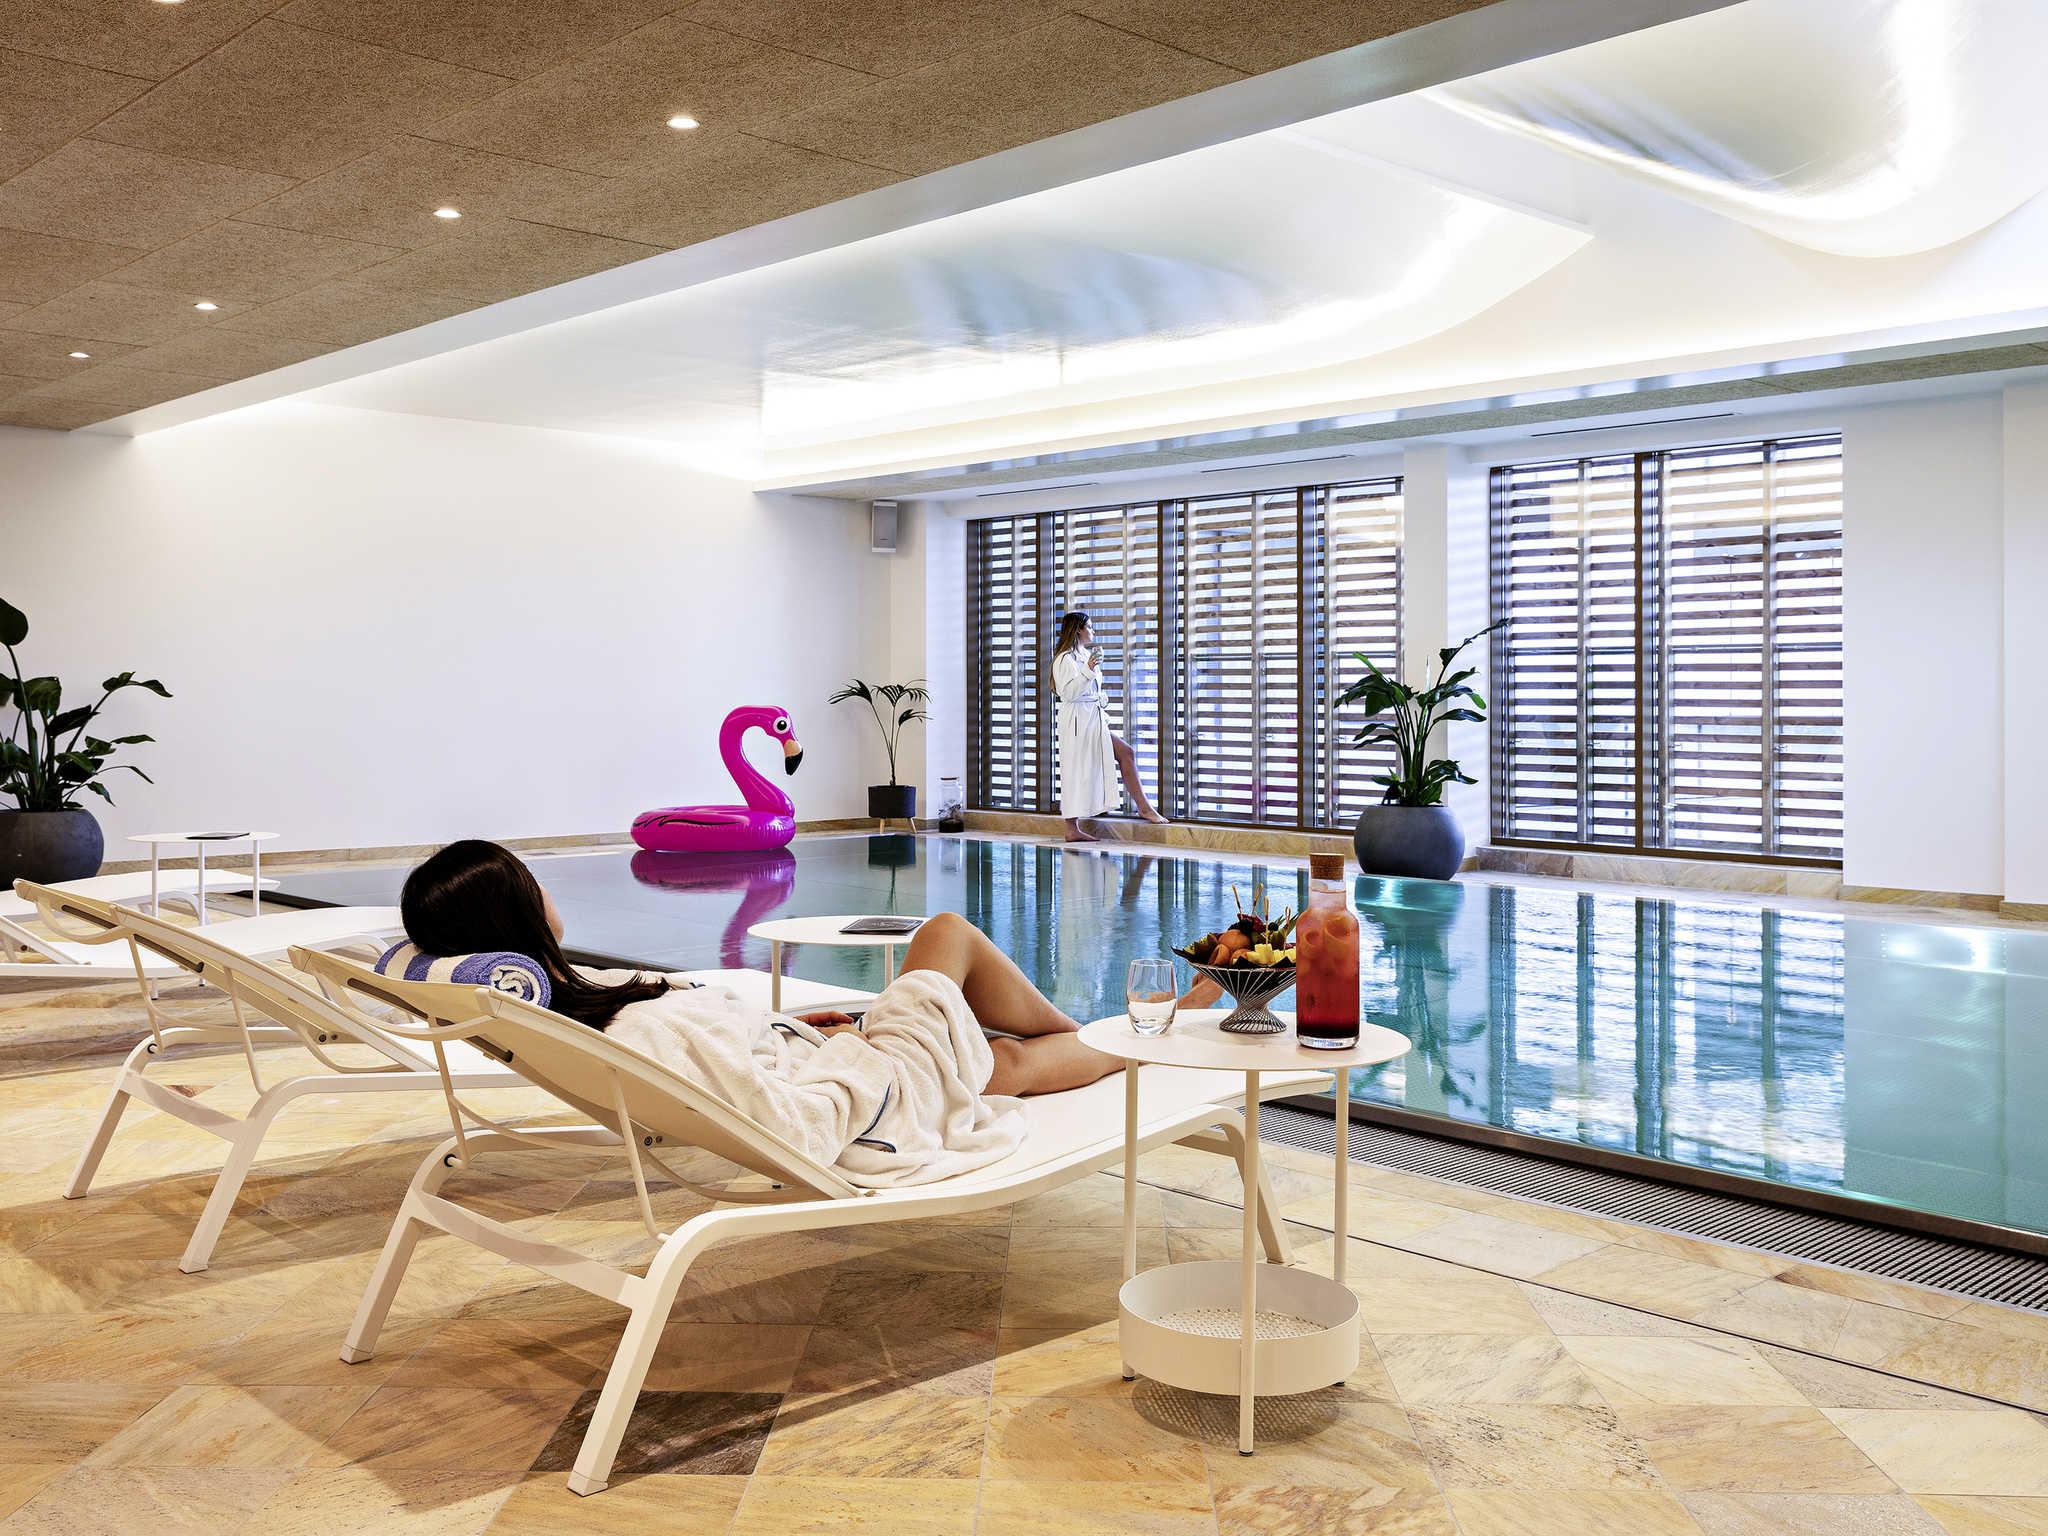 Hotel – Pullman Paris Centre - Bercy